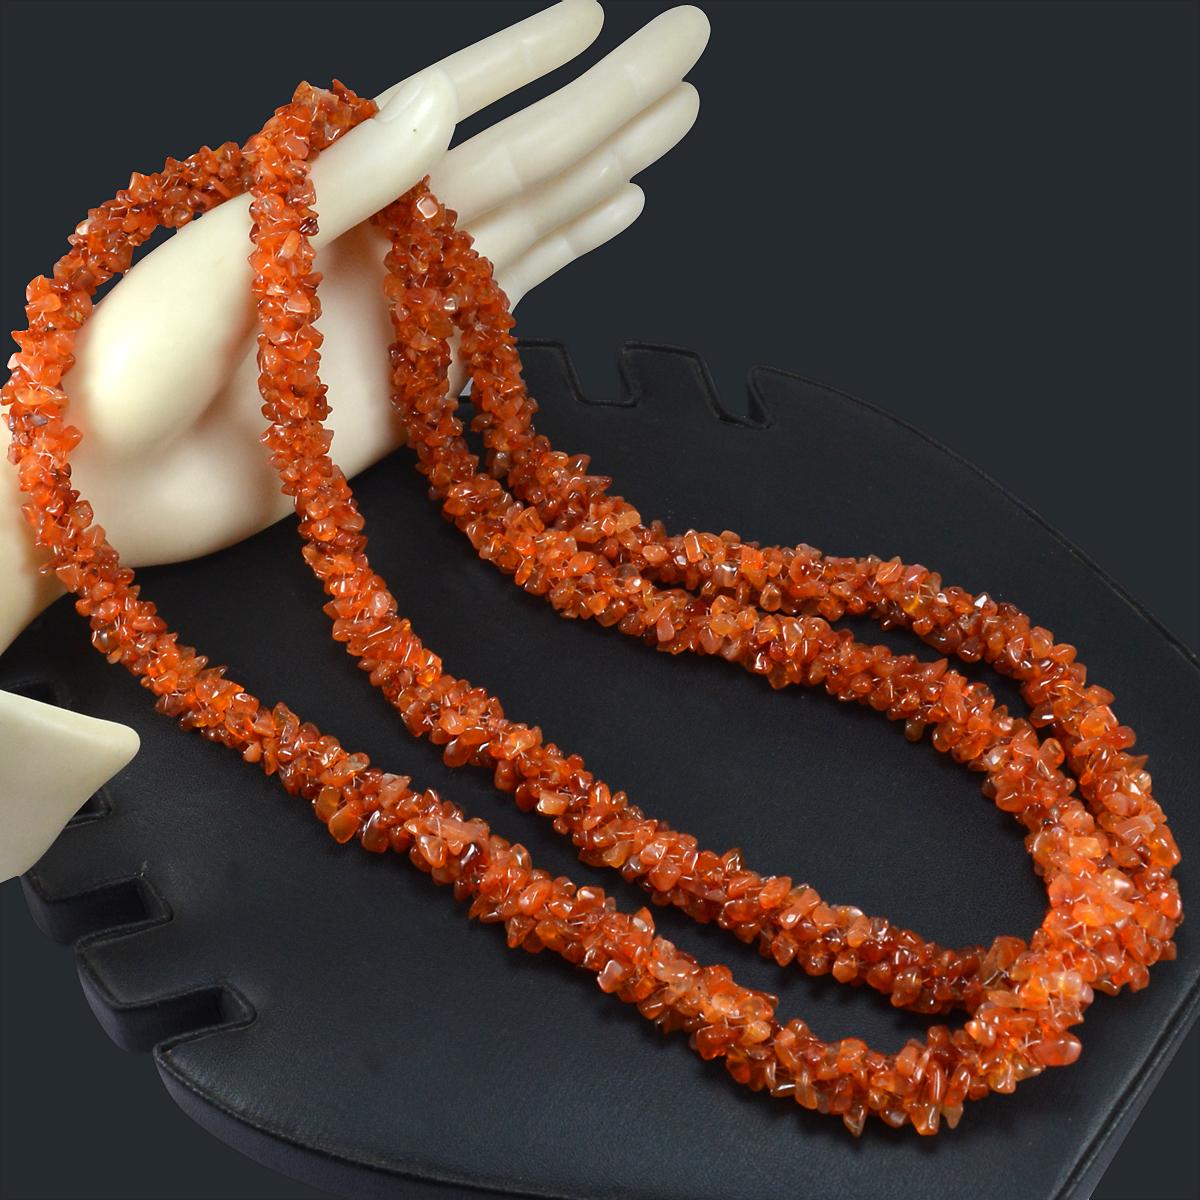 Carnelian Gemstone Chips Necklace PG-156069